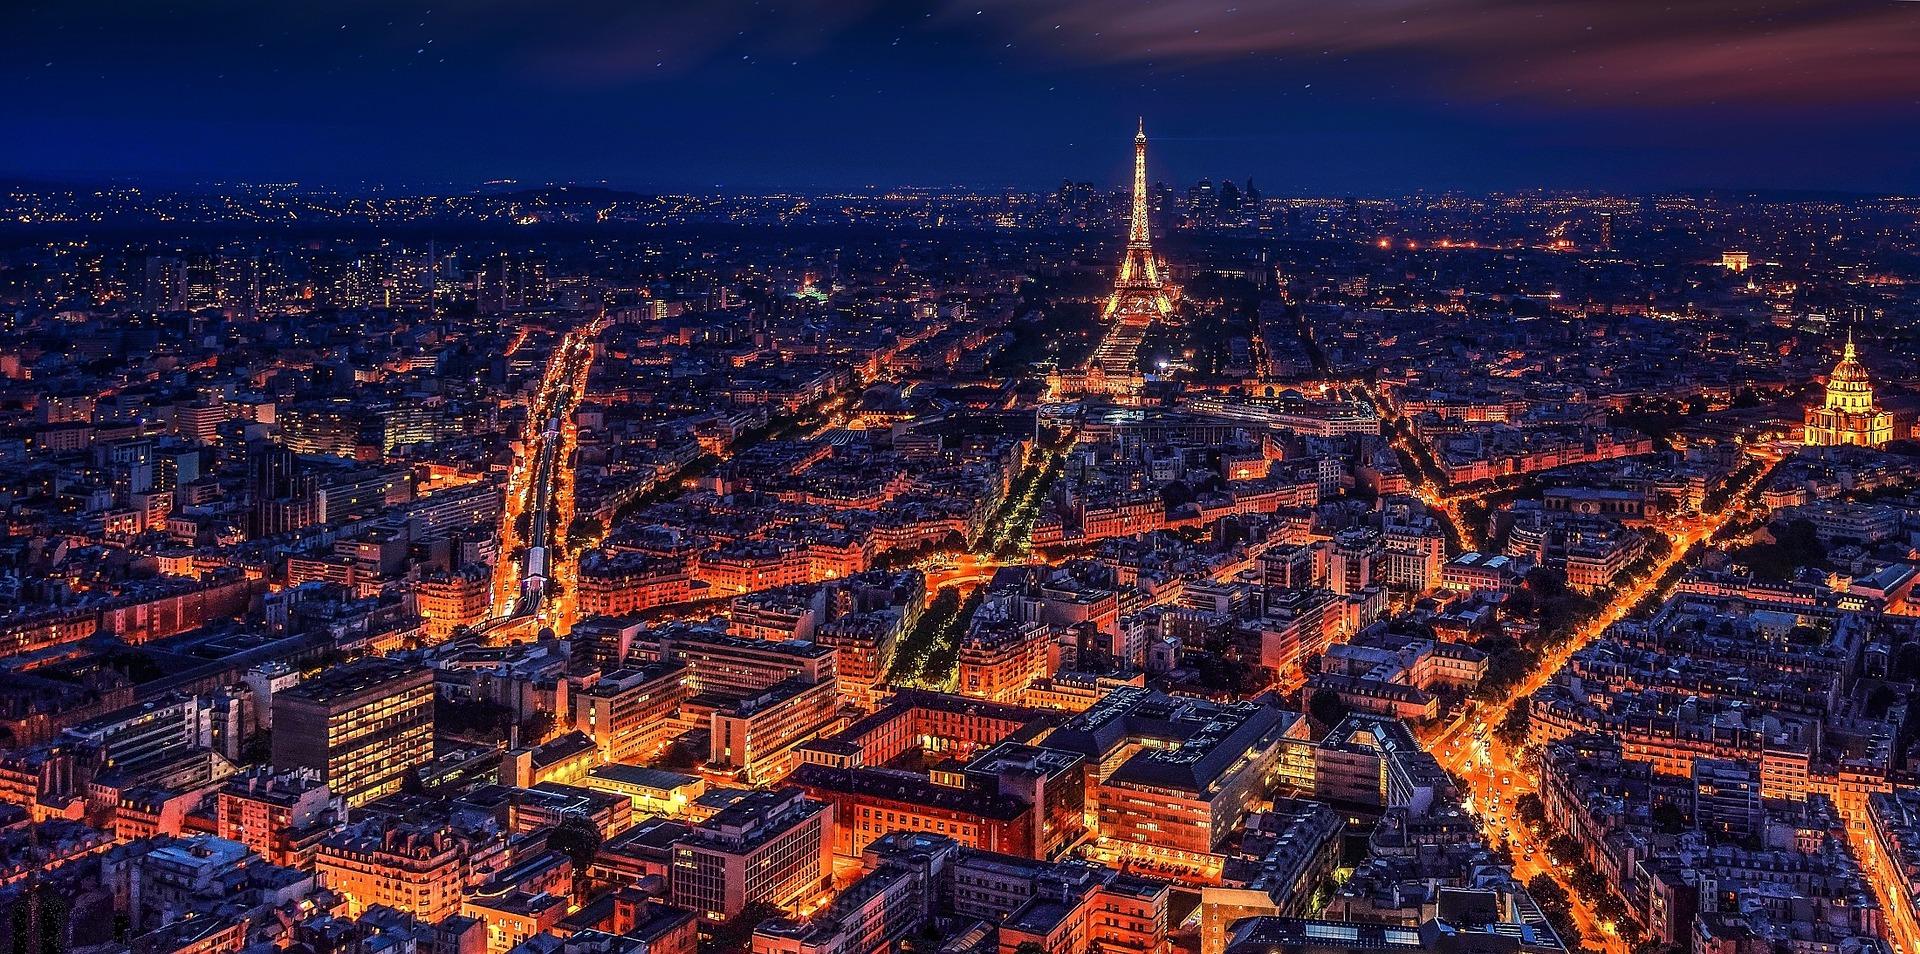 pariz, francuska, evropa, gradovi, cene, najskuplji, najjeftiniji